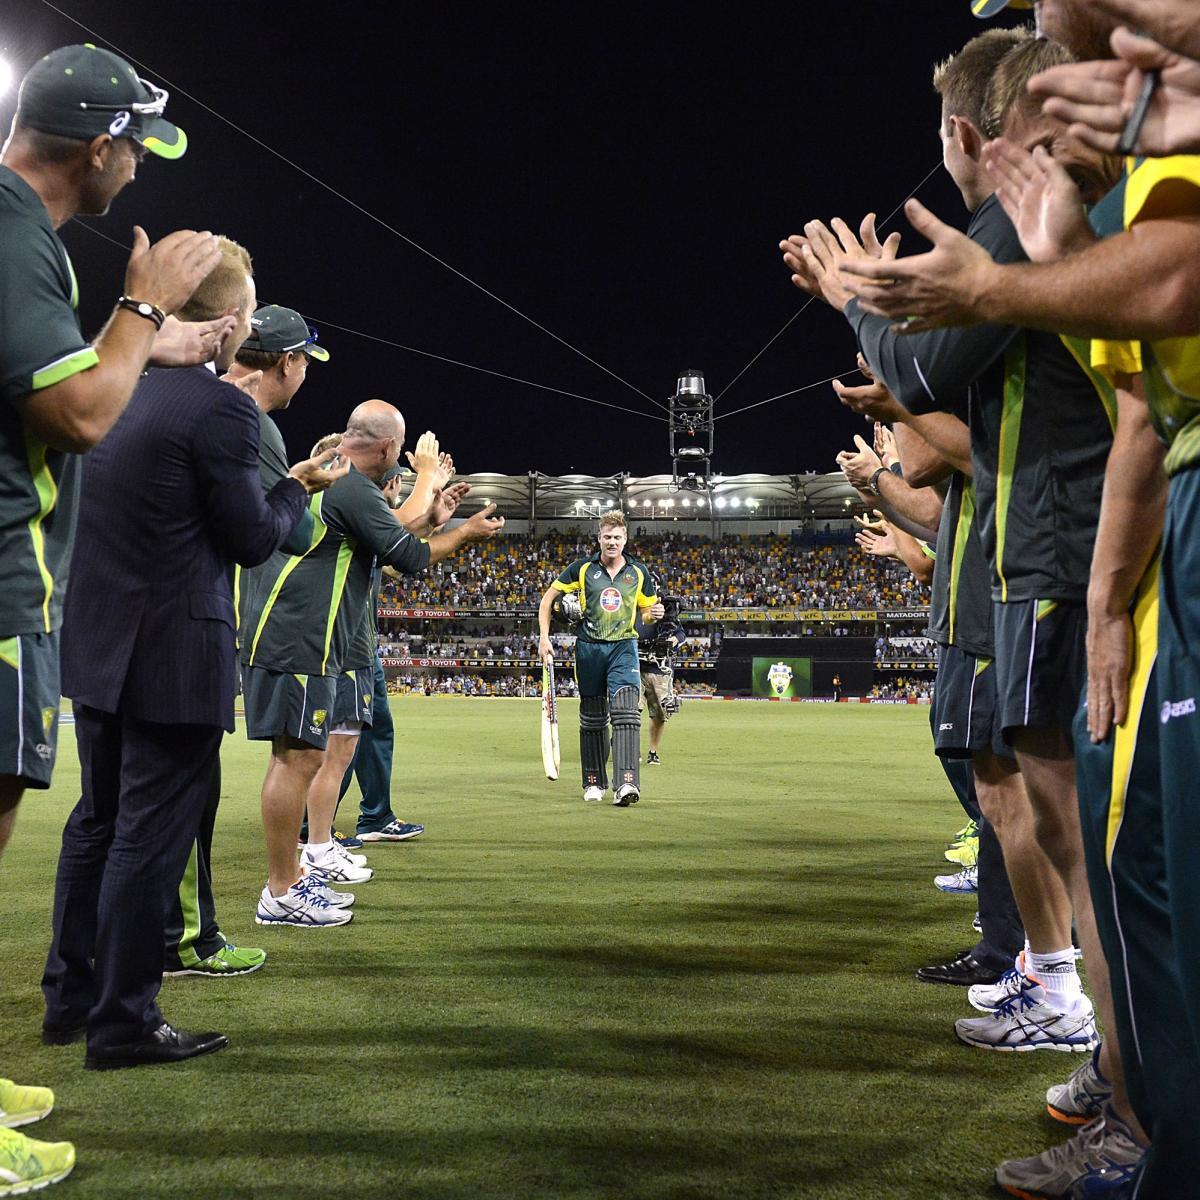 Australia Vs. England, 3rd ODI: Date, Time, Live Stream